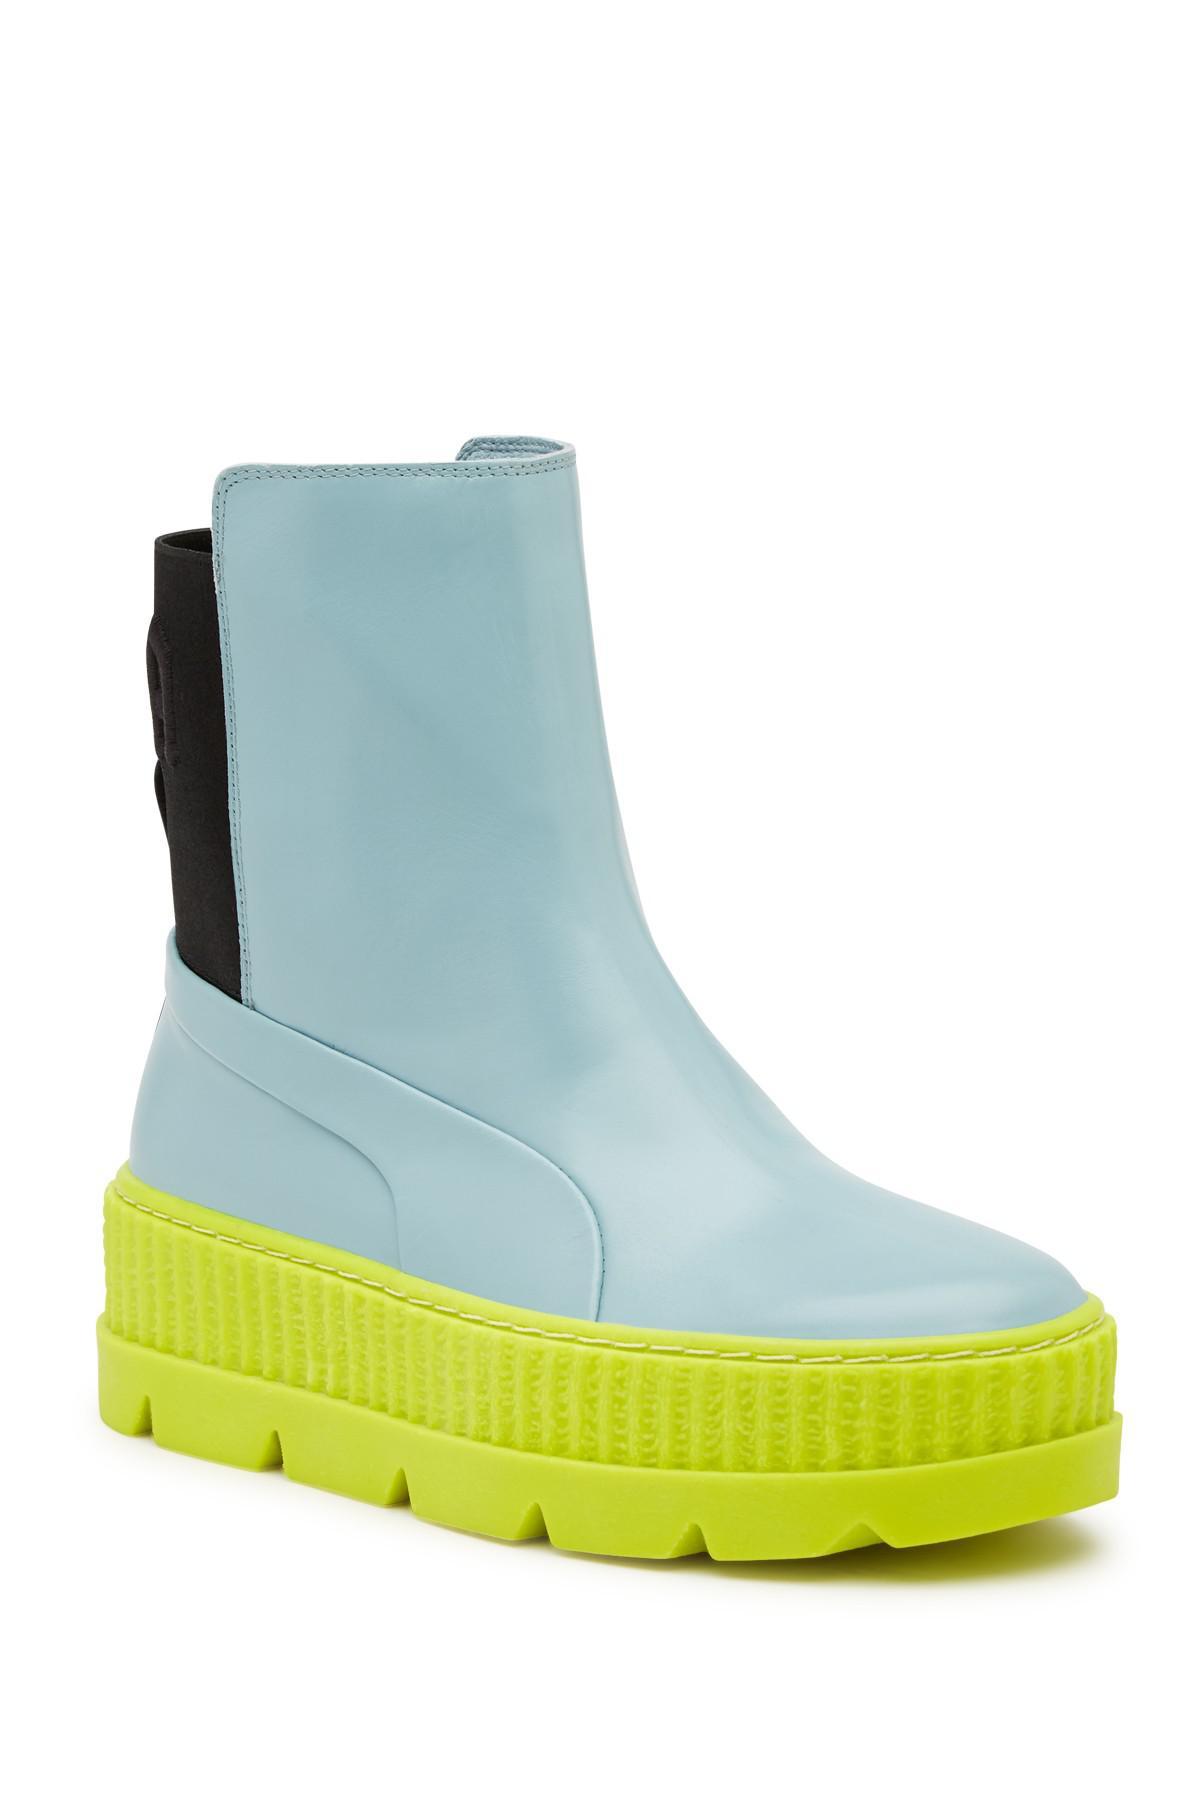 1c125319cee259 Lyst - PUMA Fenty By Rihanna Chelsea Boot Creeper Sneaker in Blue